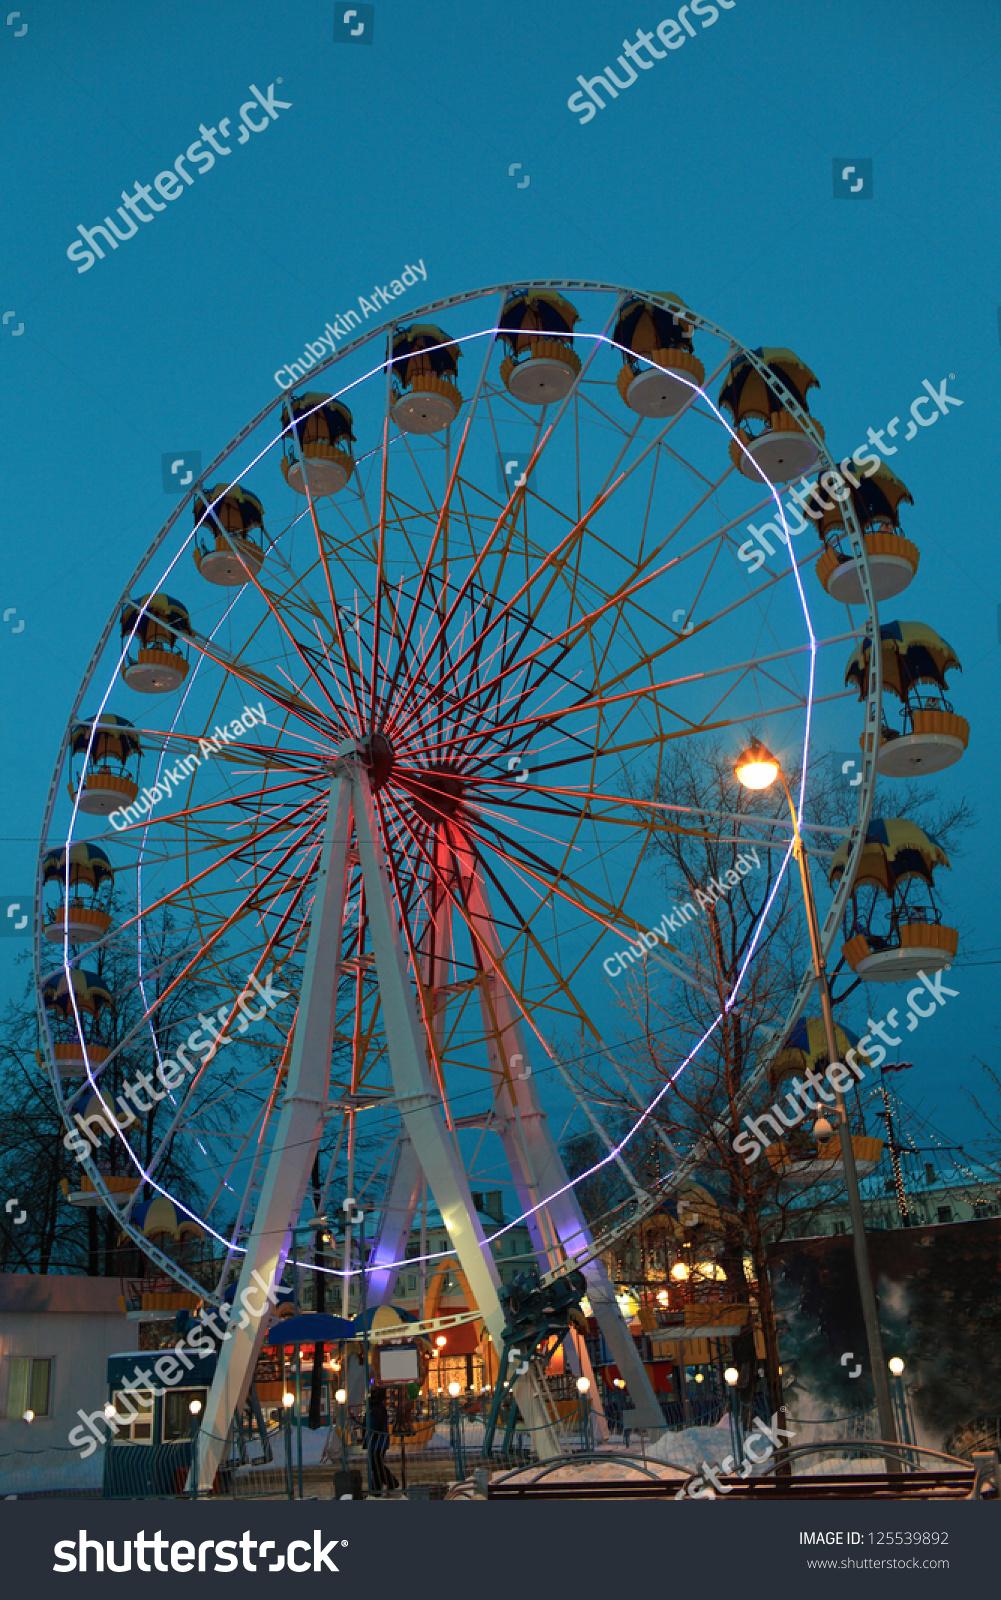 Ferris Wheel On Sky Background Winter Stock Photo